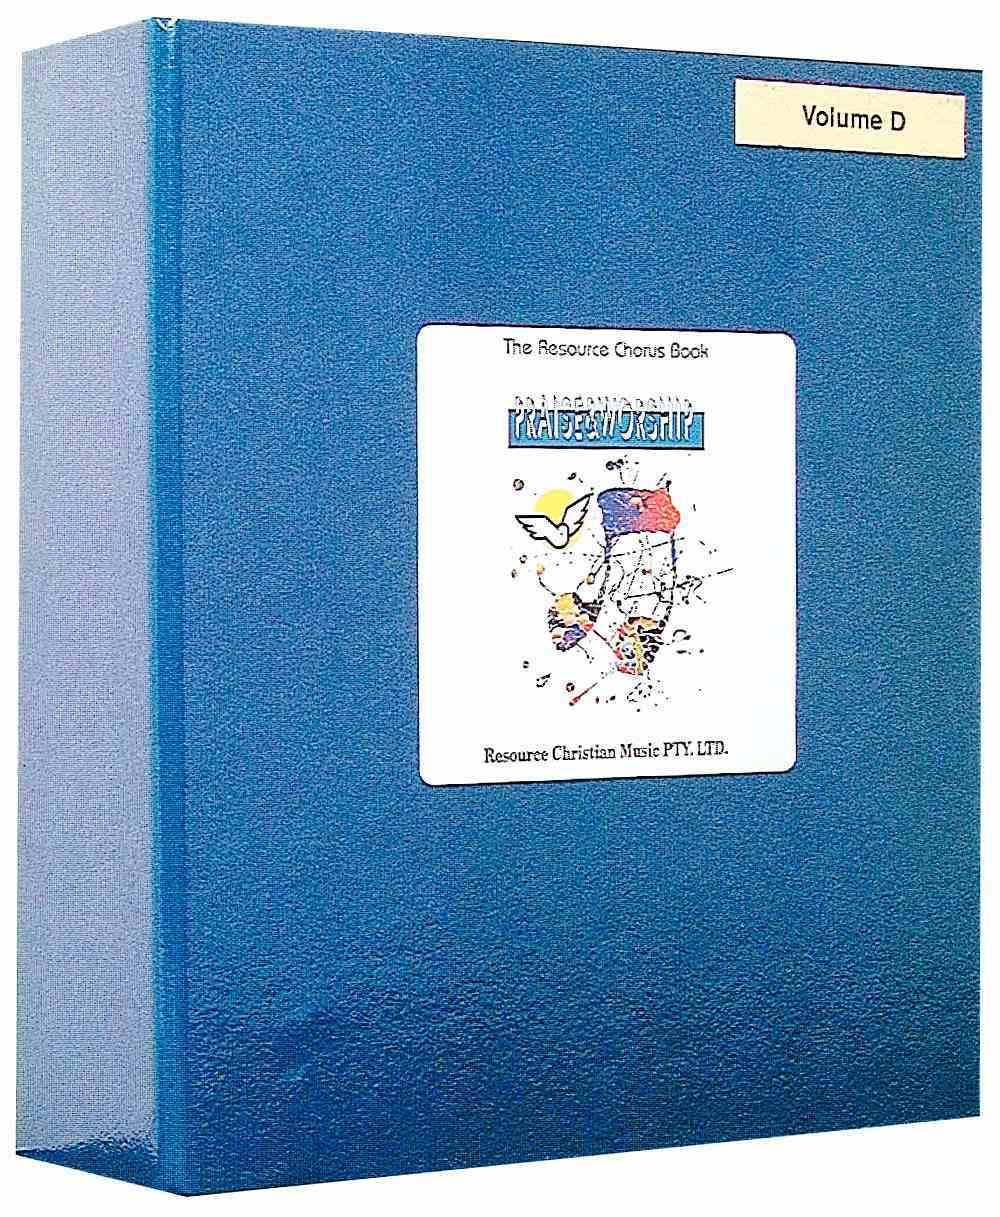 Rcm Volume D Music Book (In 3 Ring Folder) (Supp 21-27) Spiral